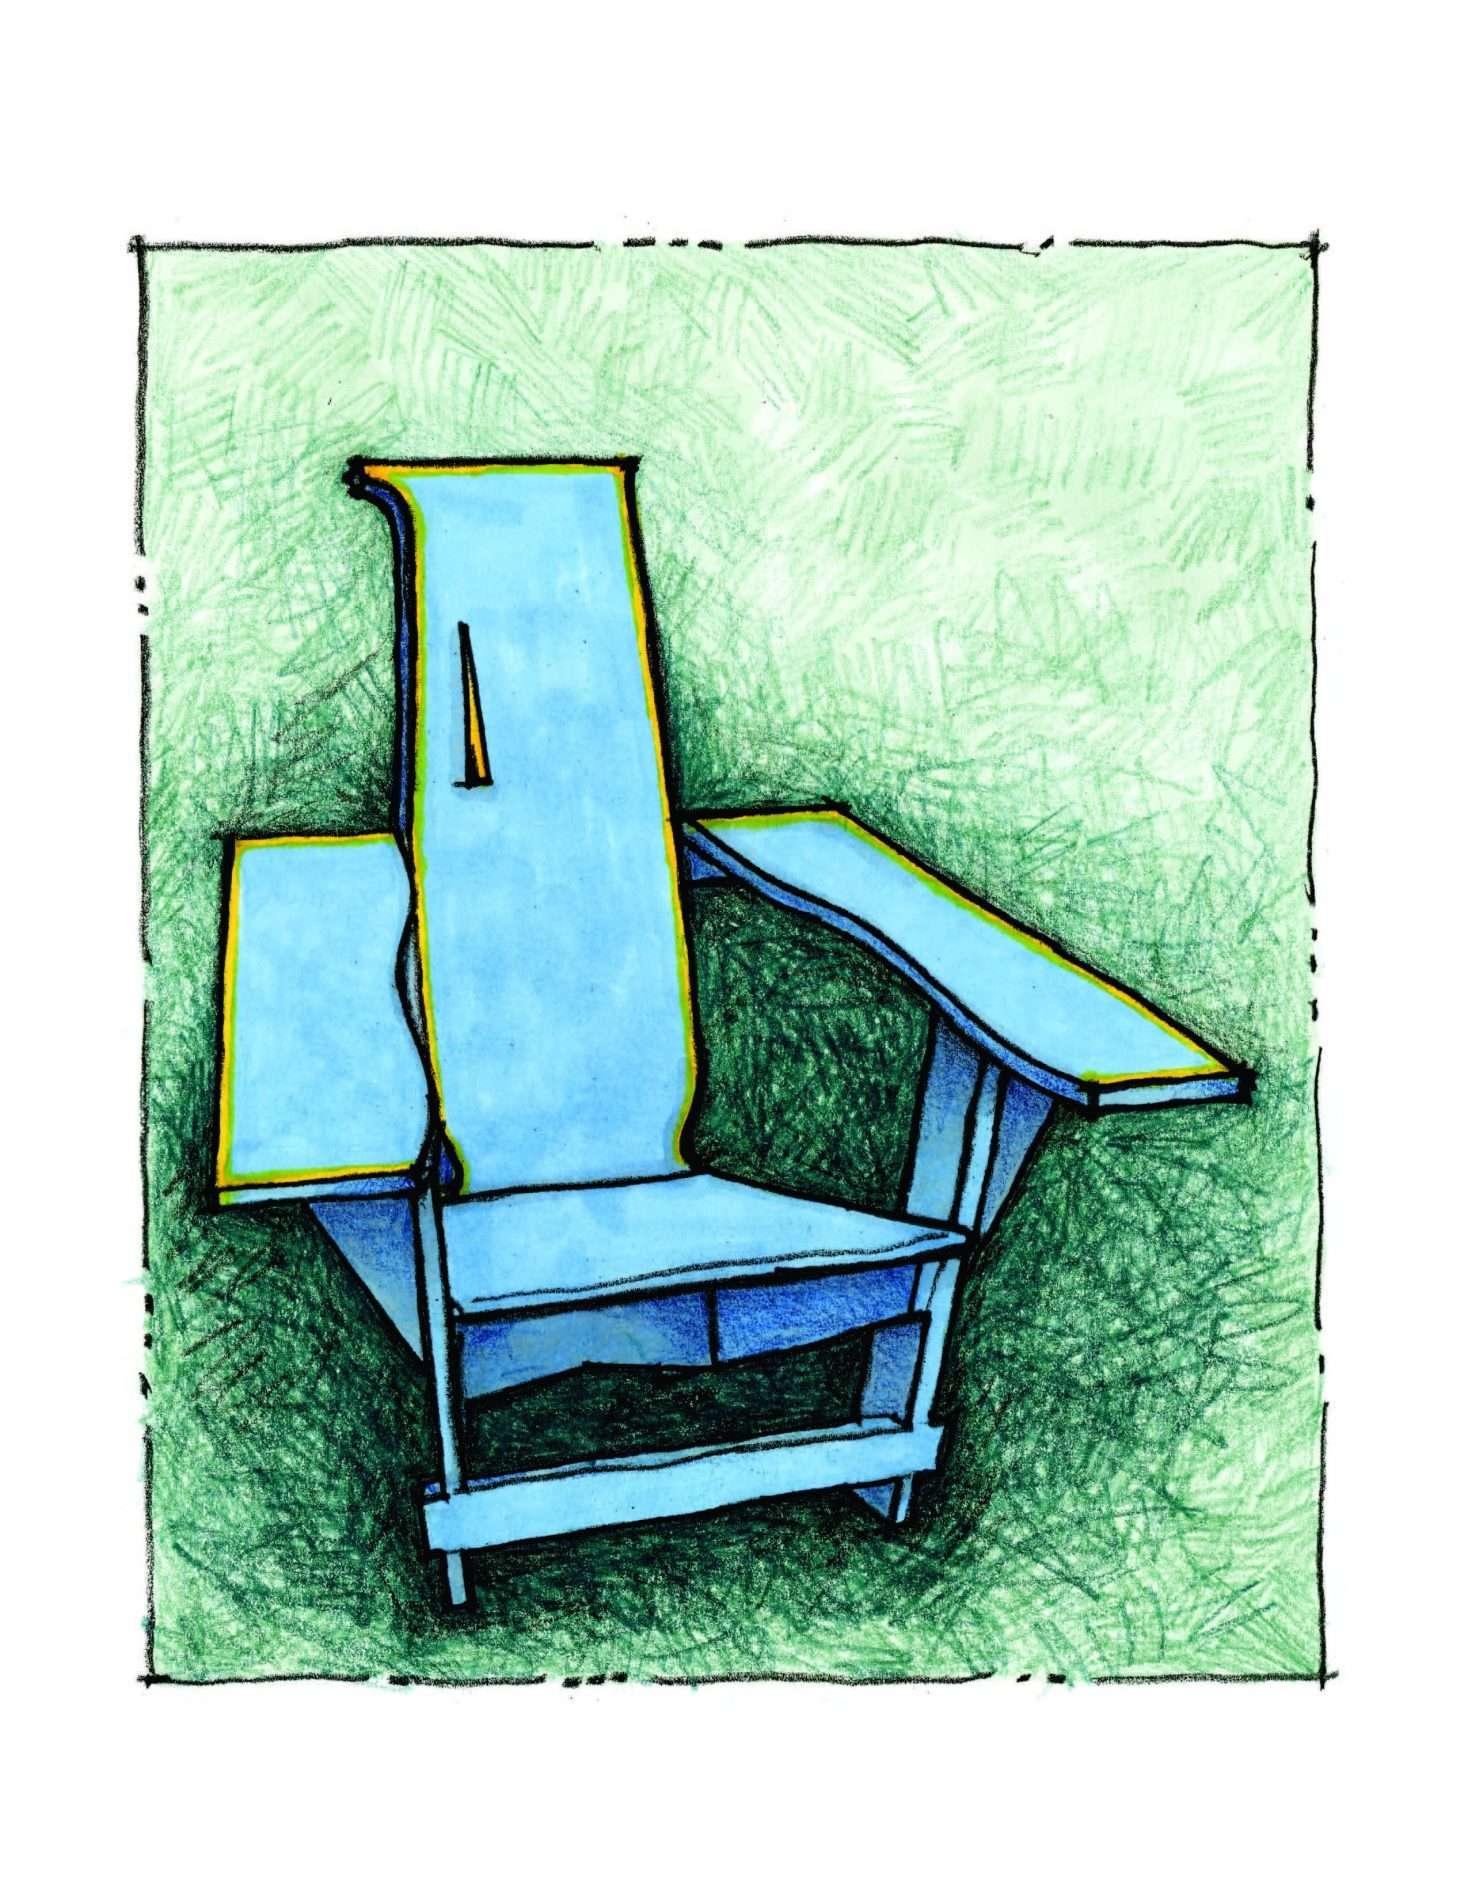 2015 Luderowski Chair 2